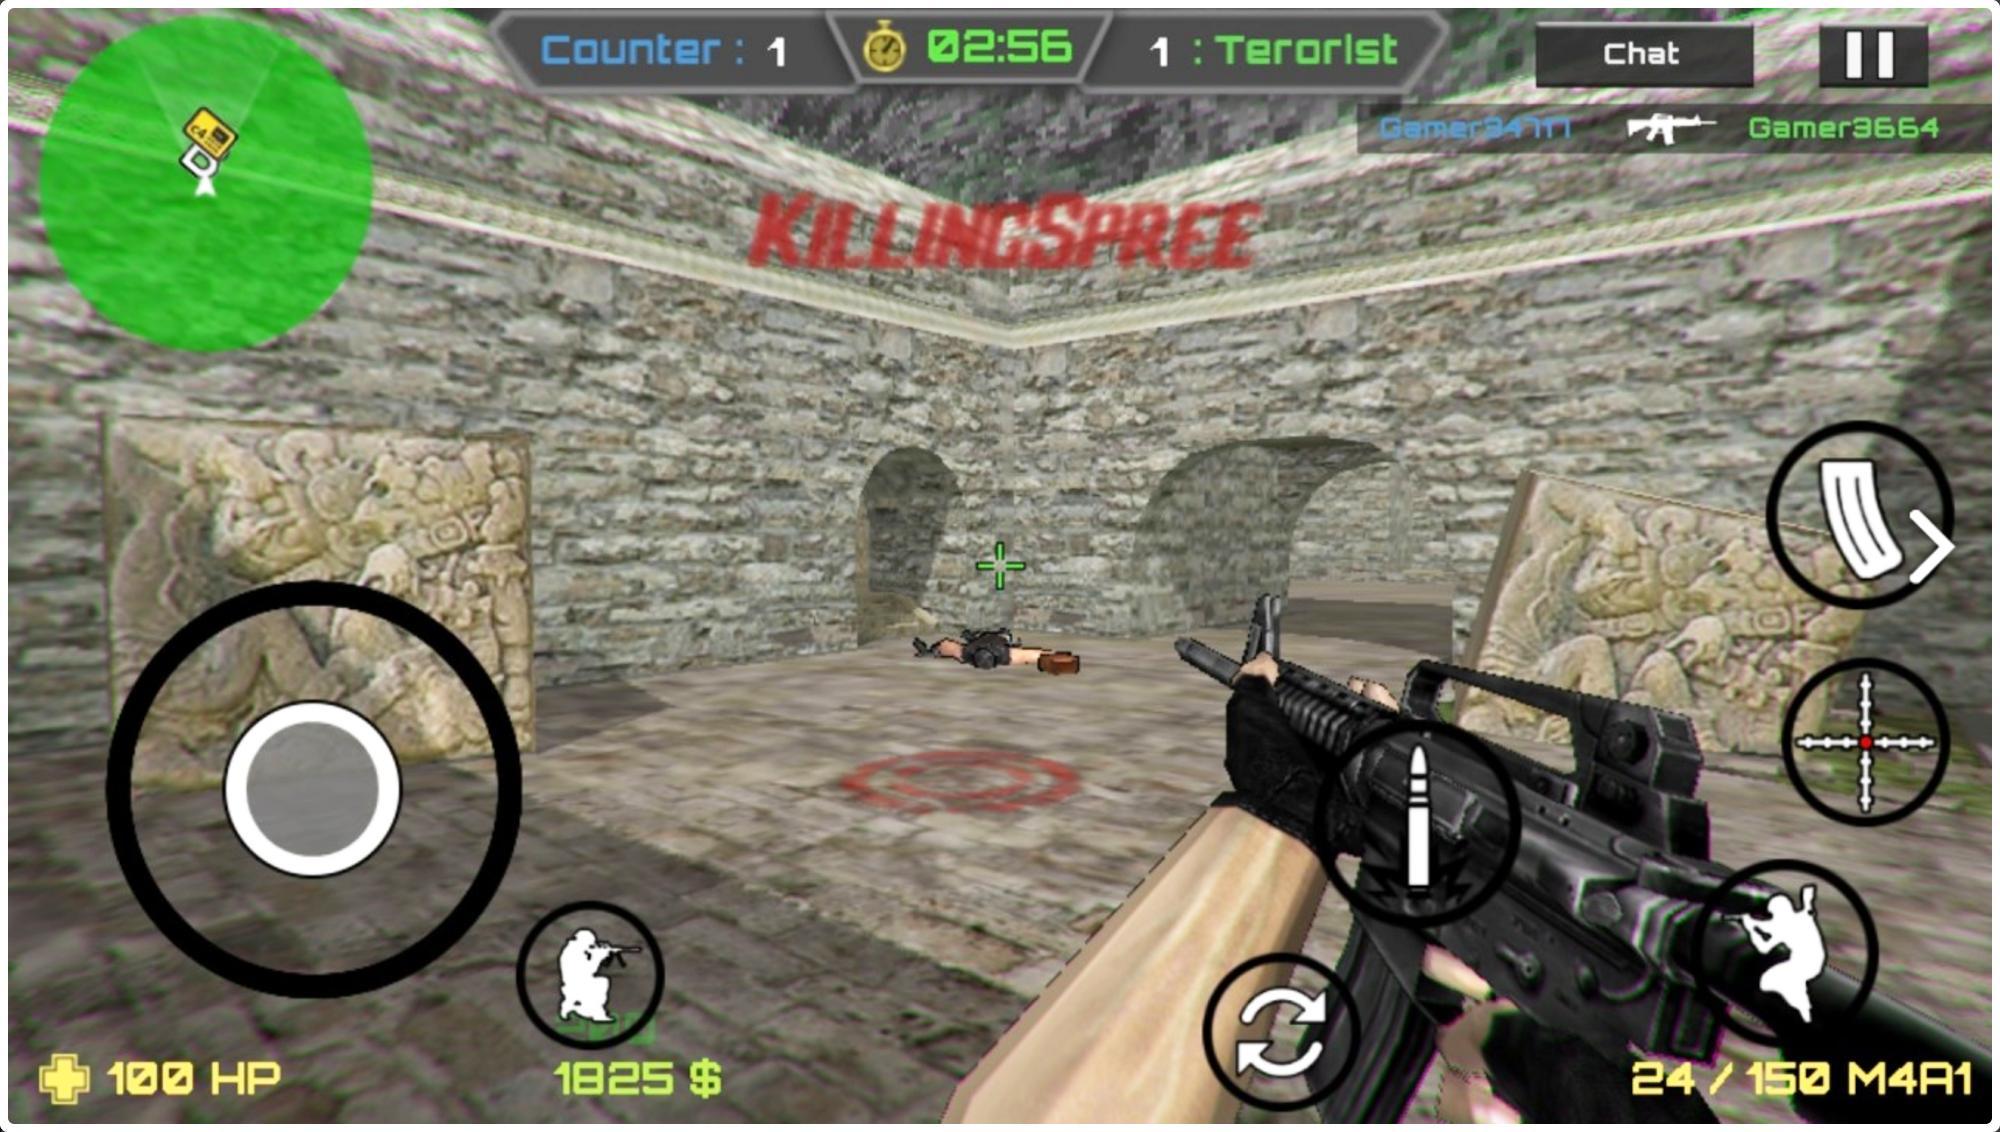 Combat Strike Online Cs For Android Apk Download - ffa gun game knife game roblox